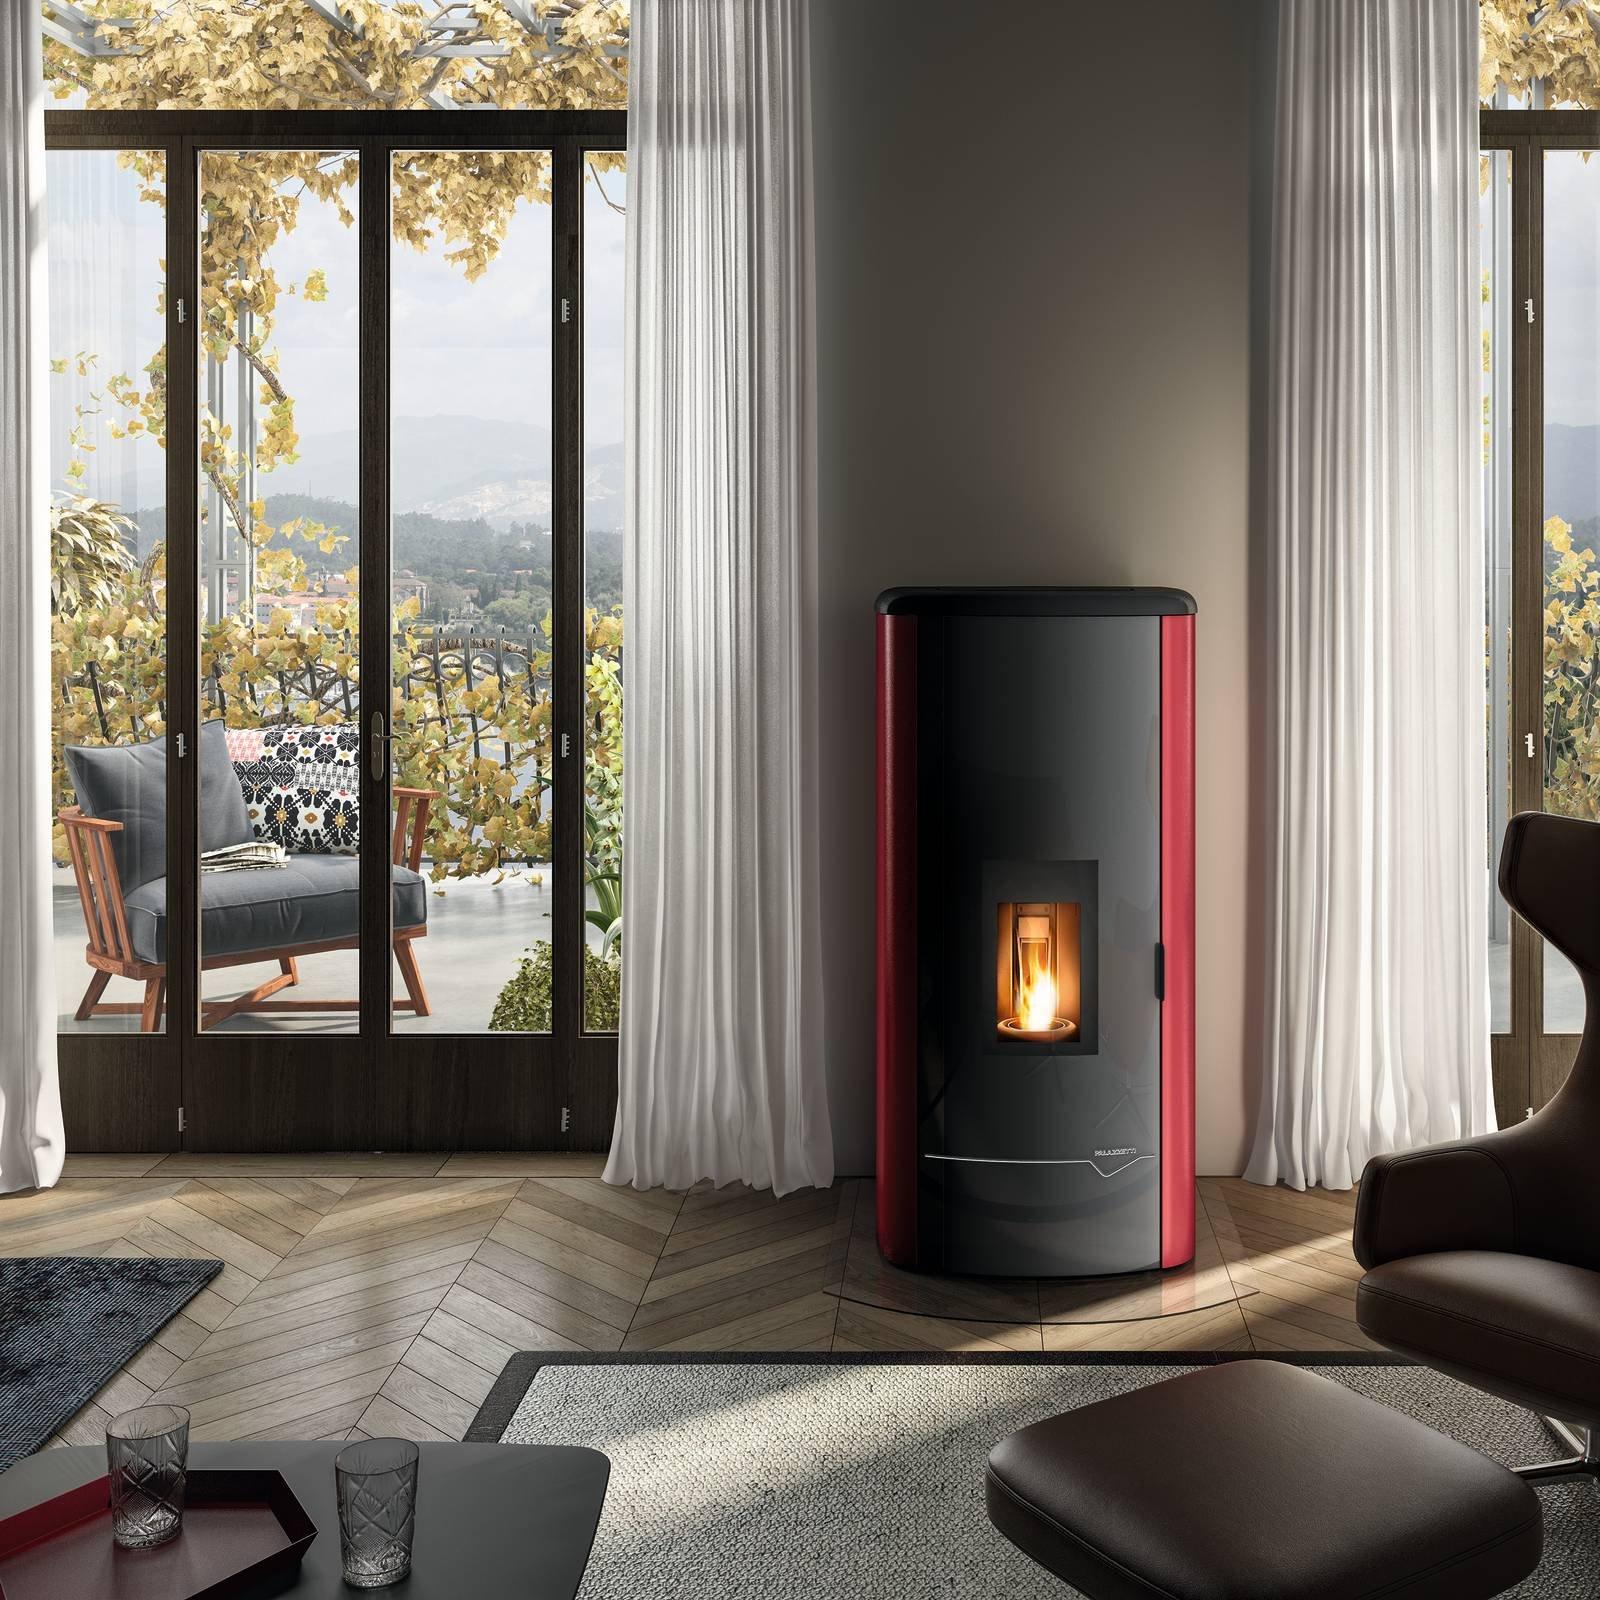 Stufe hi tech e ad alta efficienza energetica cose di casa for Stufe a pellet moderne palazzetti